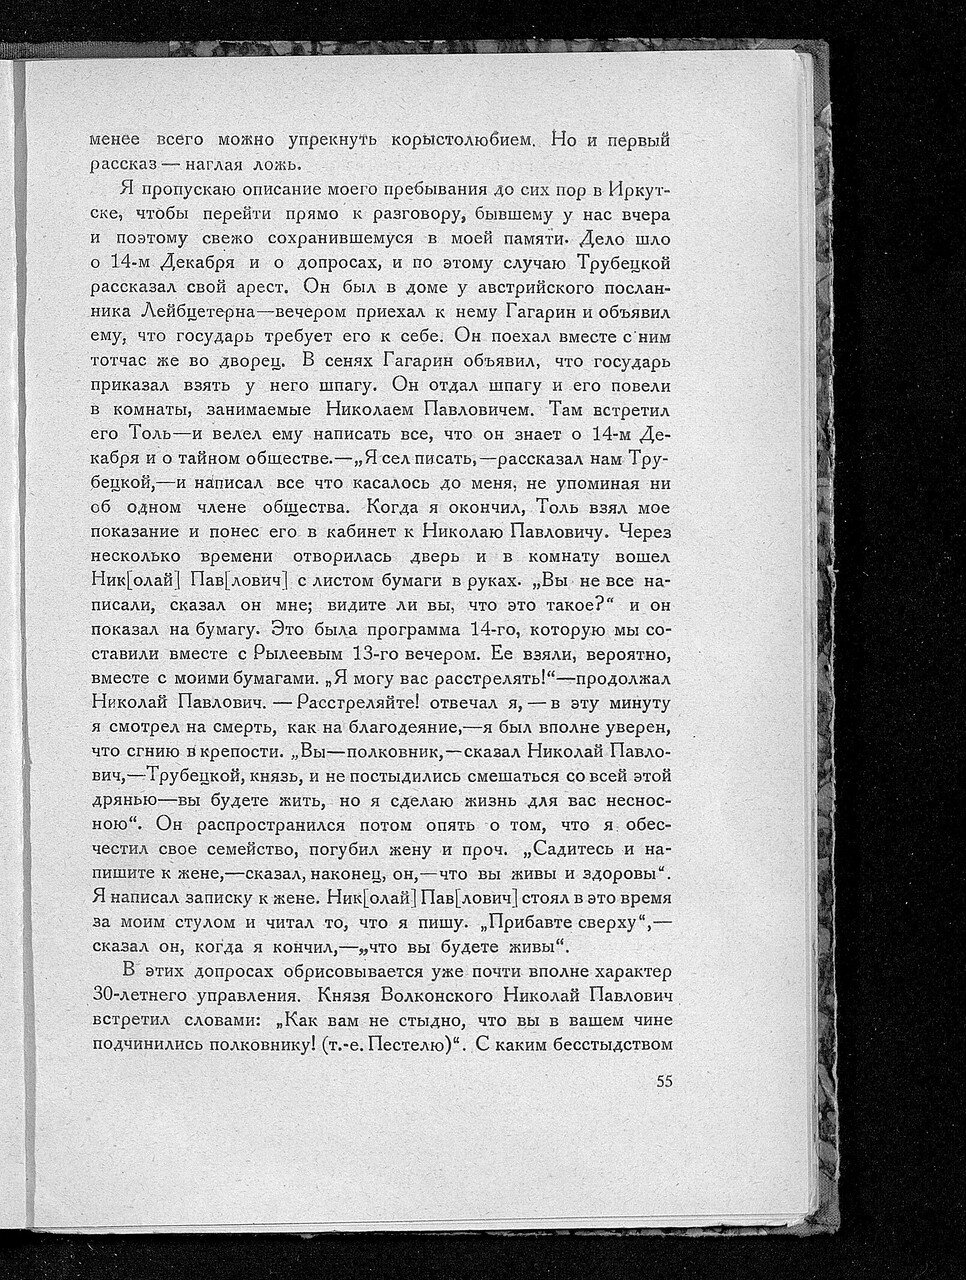 https://img-fotki.yandex.ru/get/876984/199368979.a1/0_214333_457b1128_XXXL.jpg